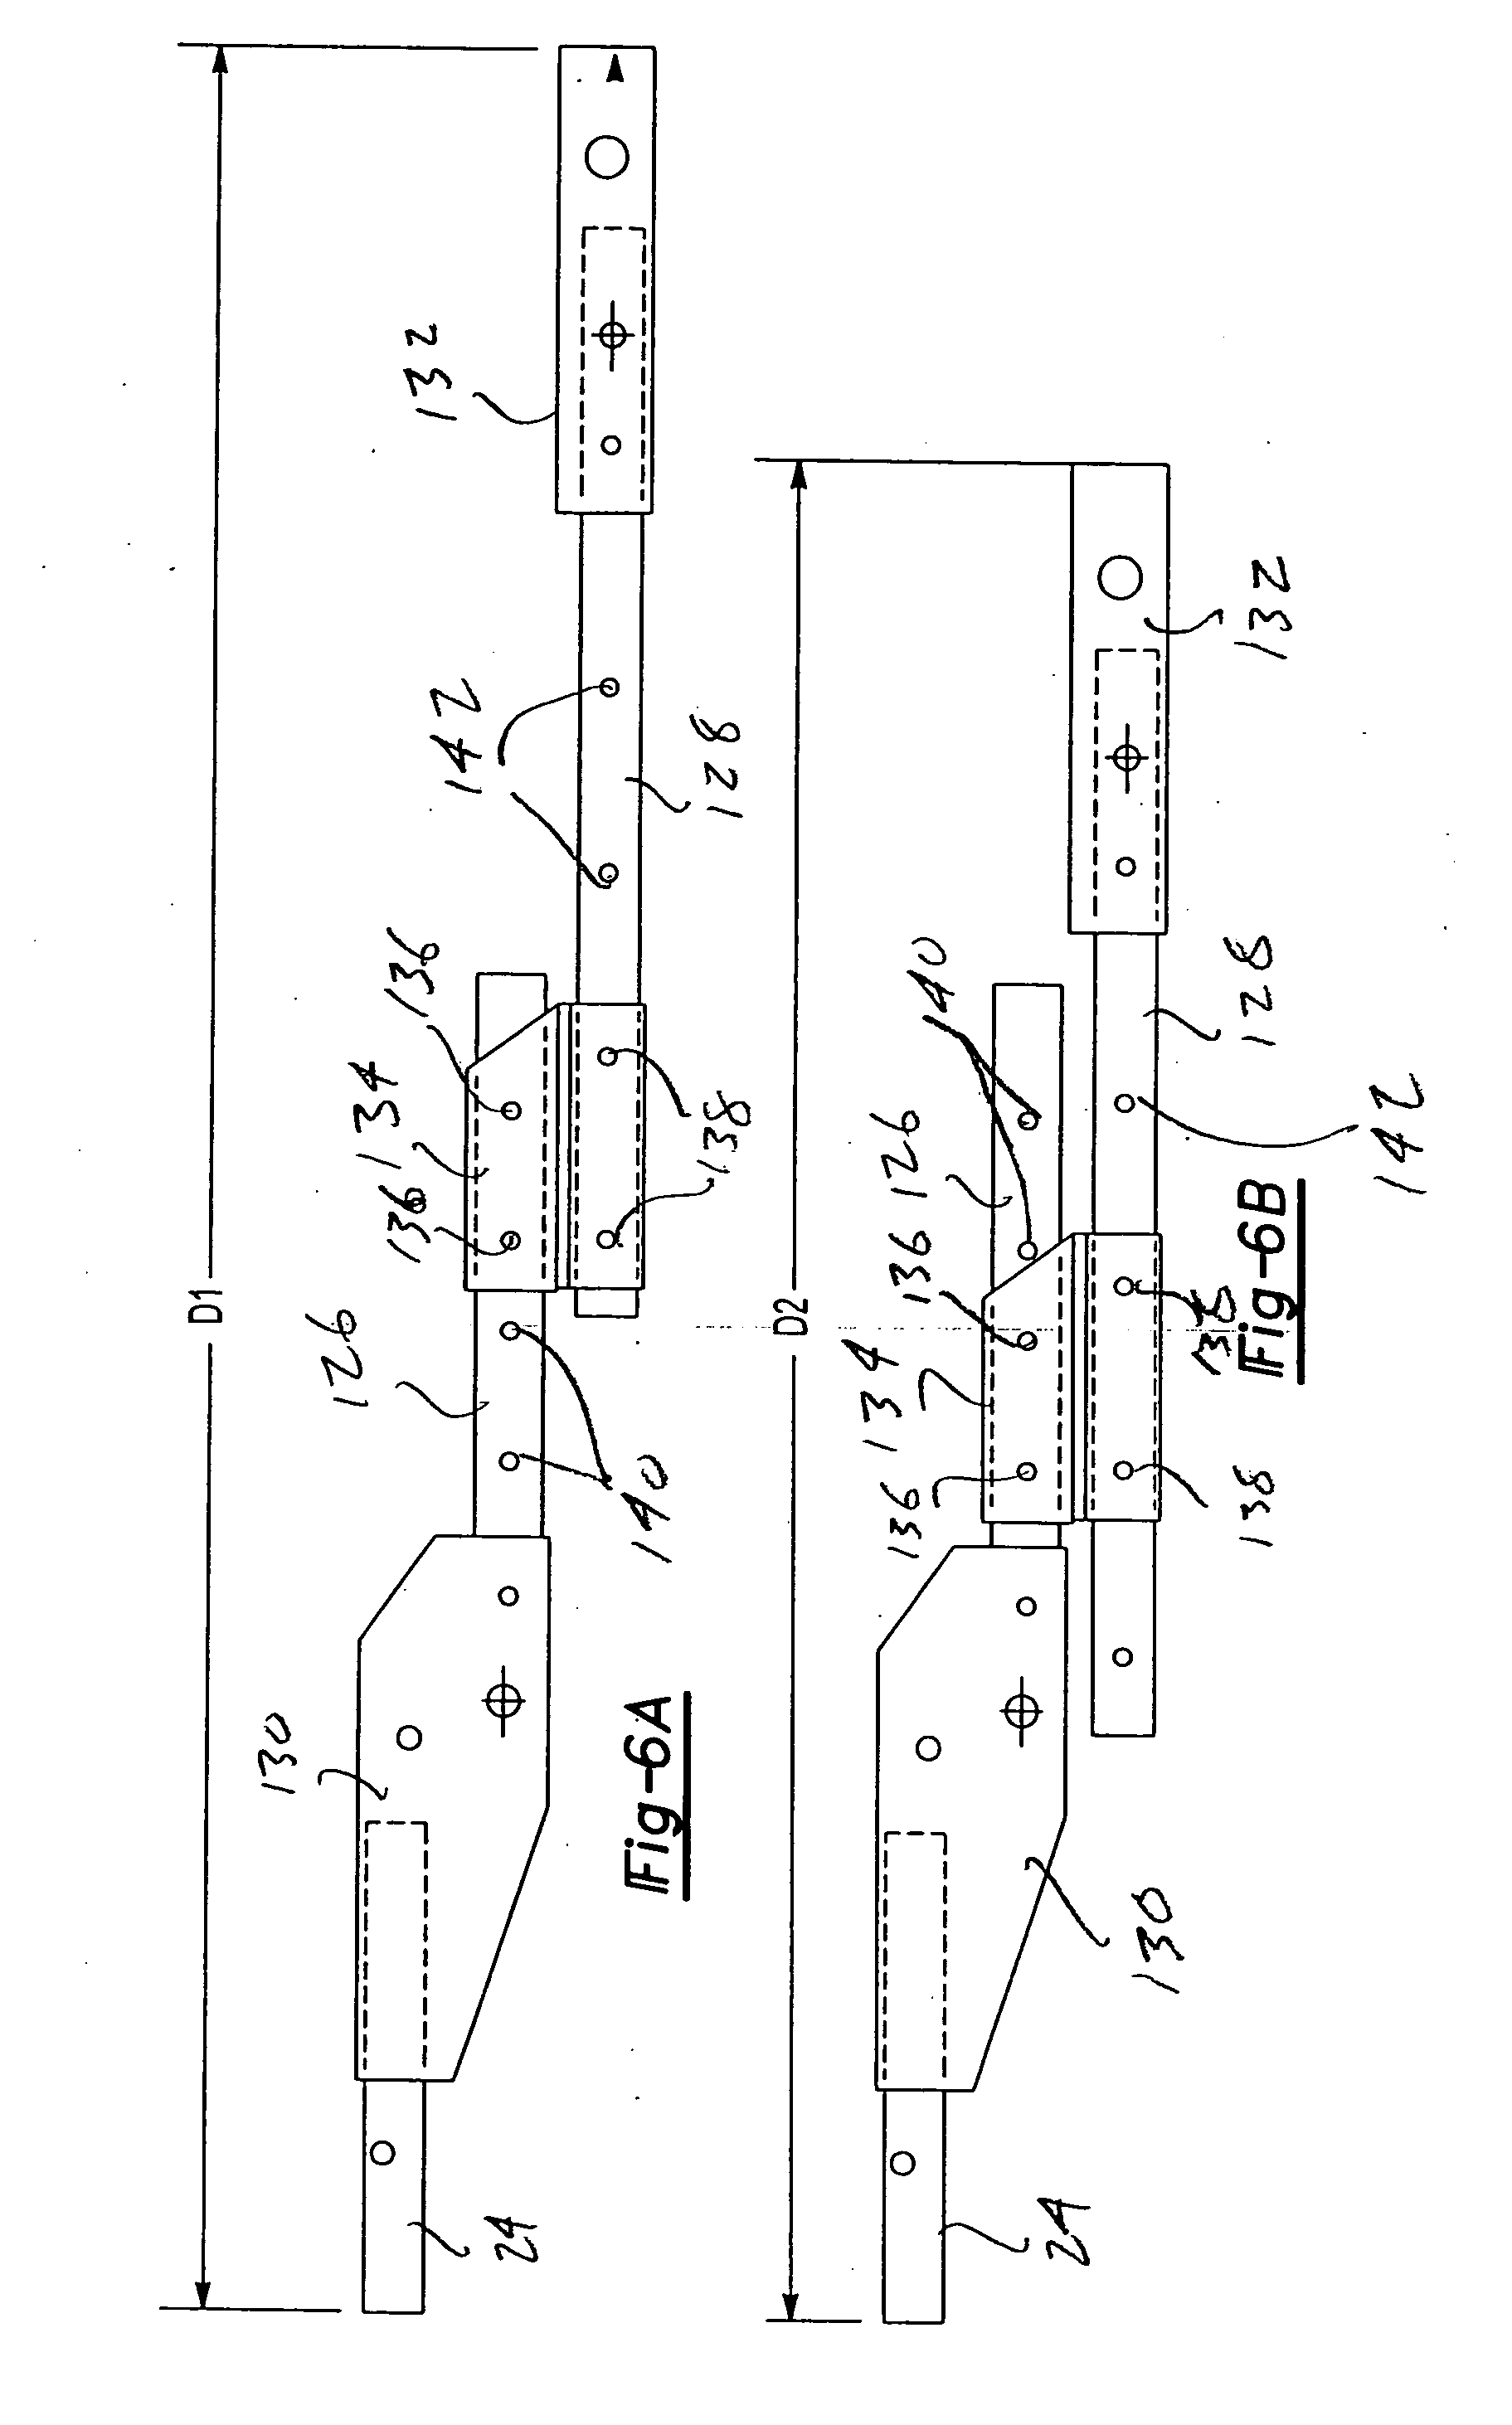 Towmaster Wiring Diagrams Switch Diagrams Wiring Diagram